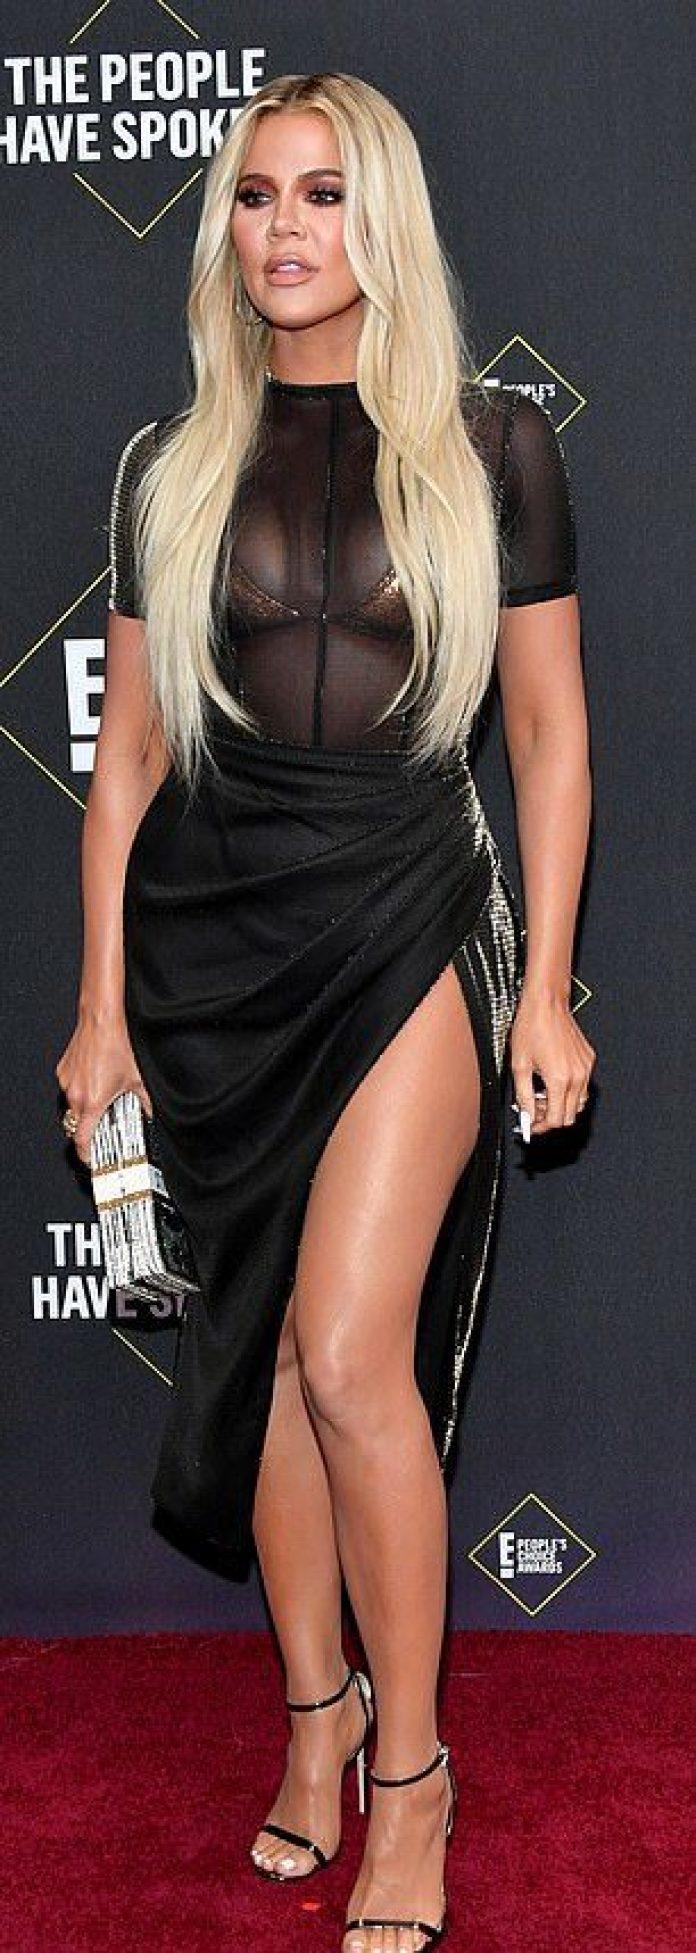 Khloe Kardashian Is Body Goals In New Bikini Snap